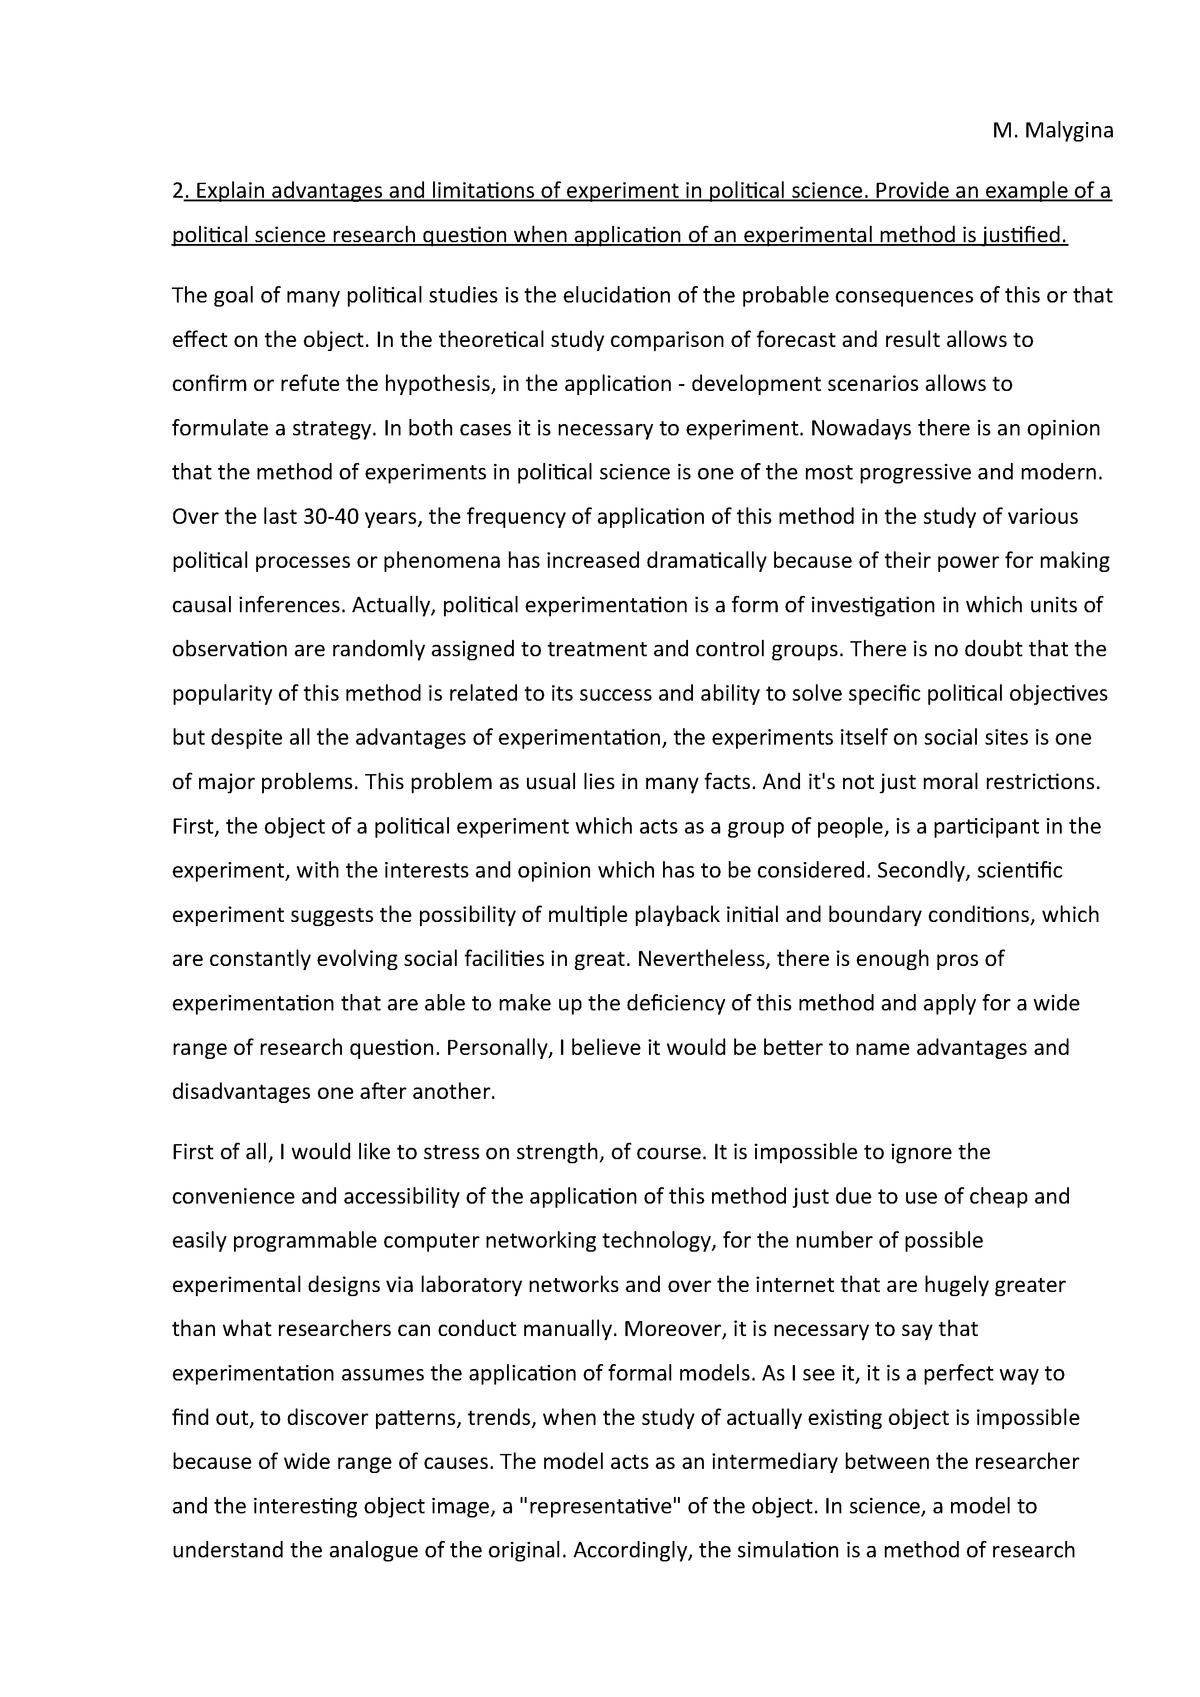 Essay - Explain advantages and limitations of experiment in